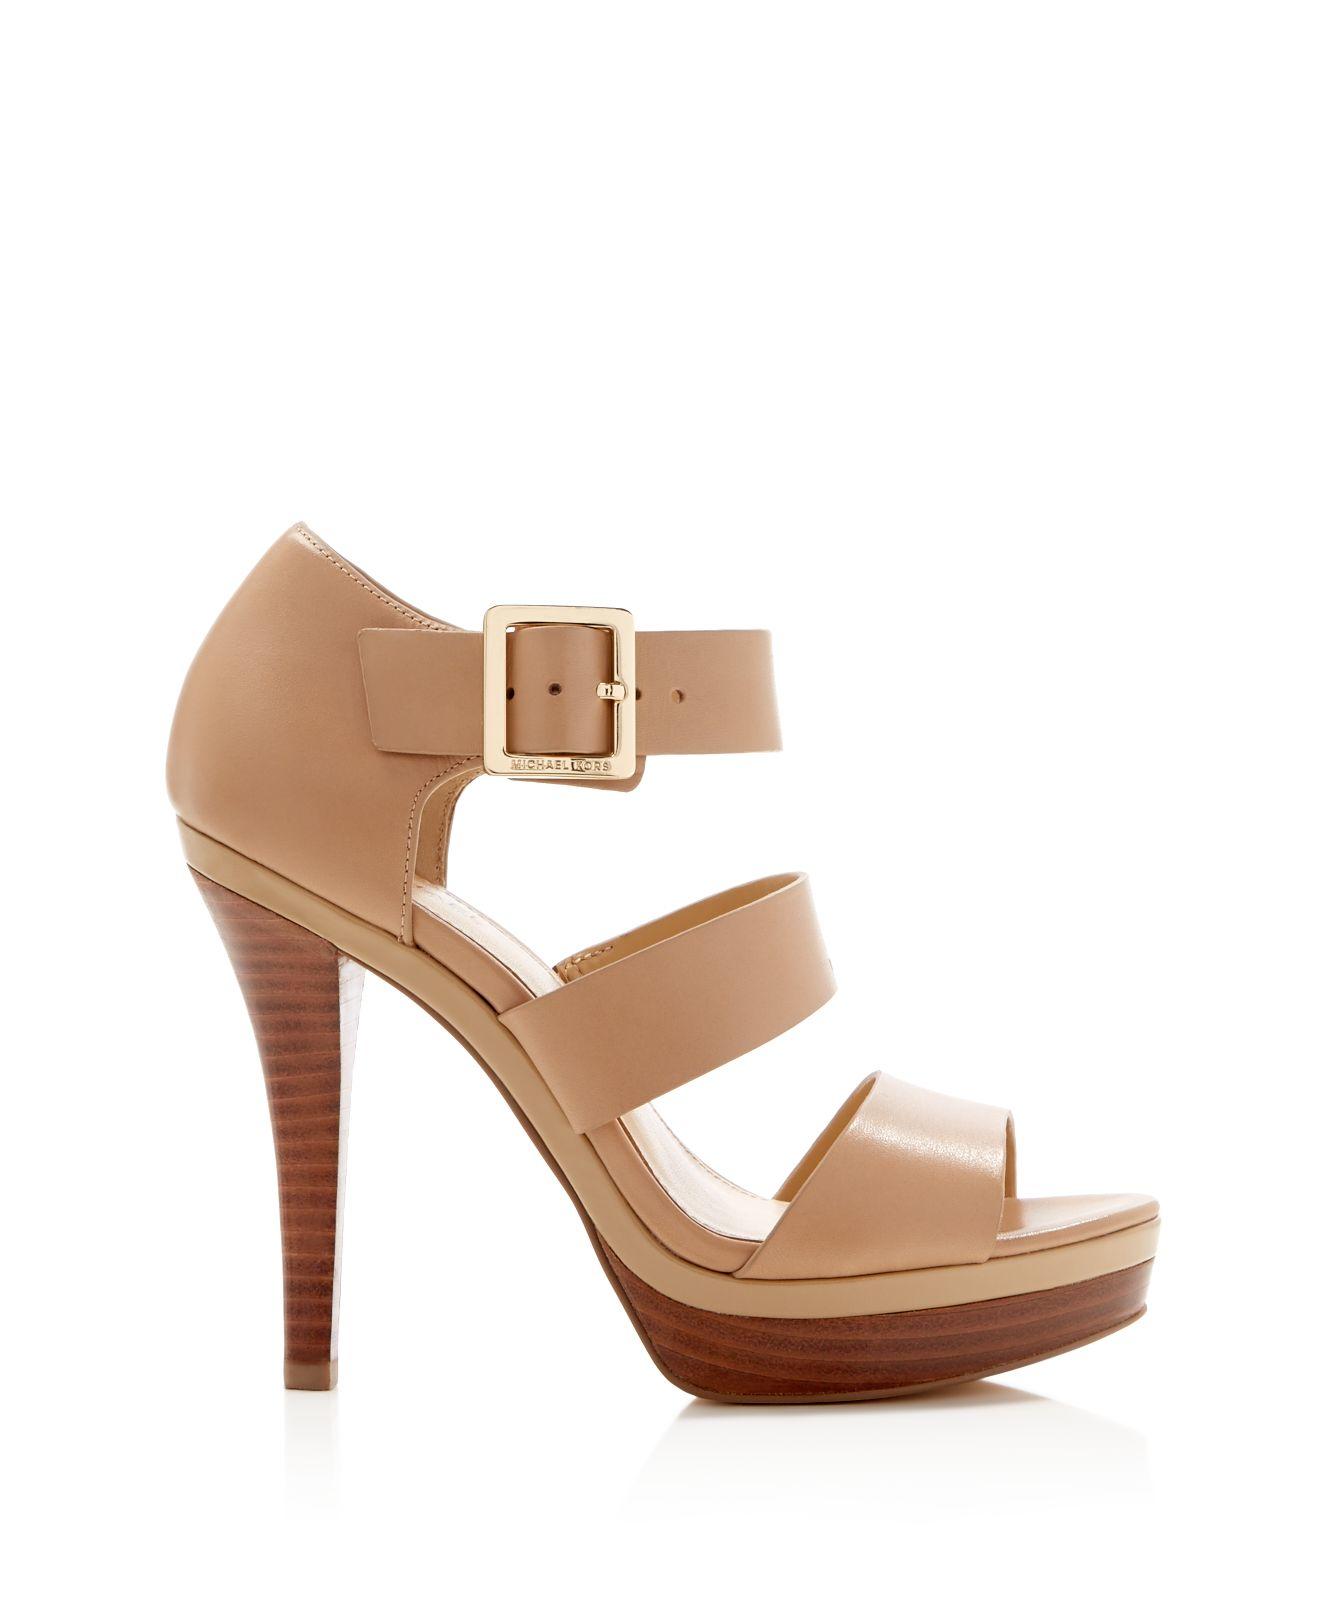 michael michael kors finley high heel platform sandals in brown lyst. Black Bedroom Furniture Sets. Home Design Ideas